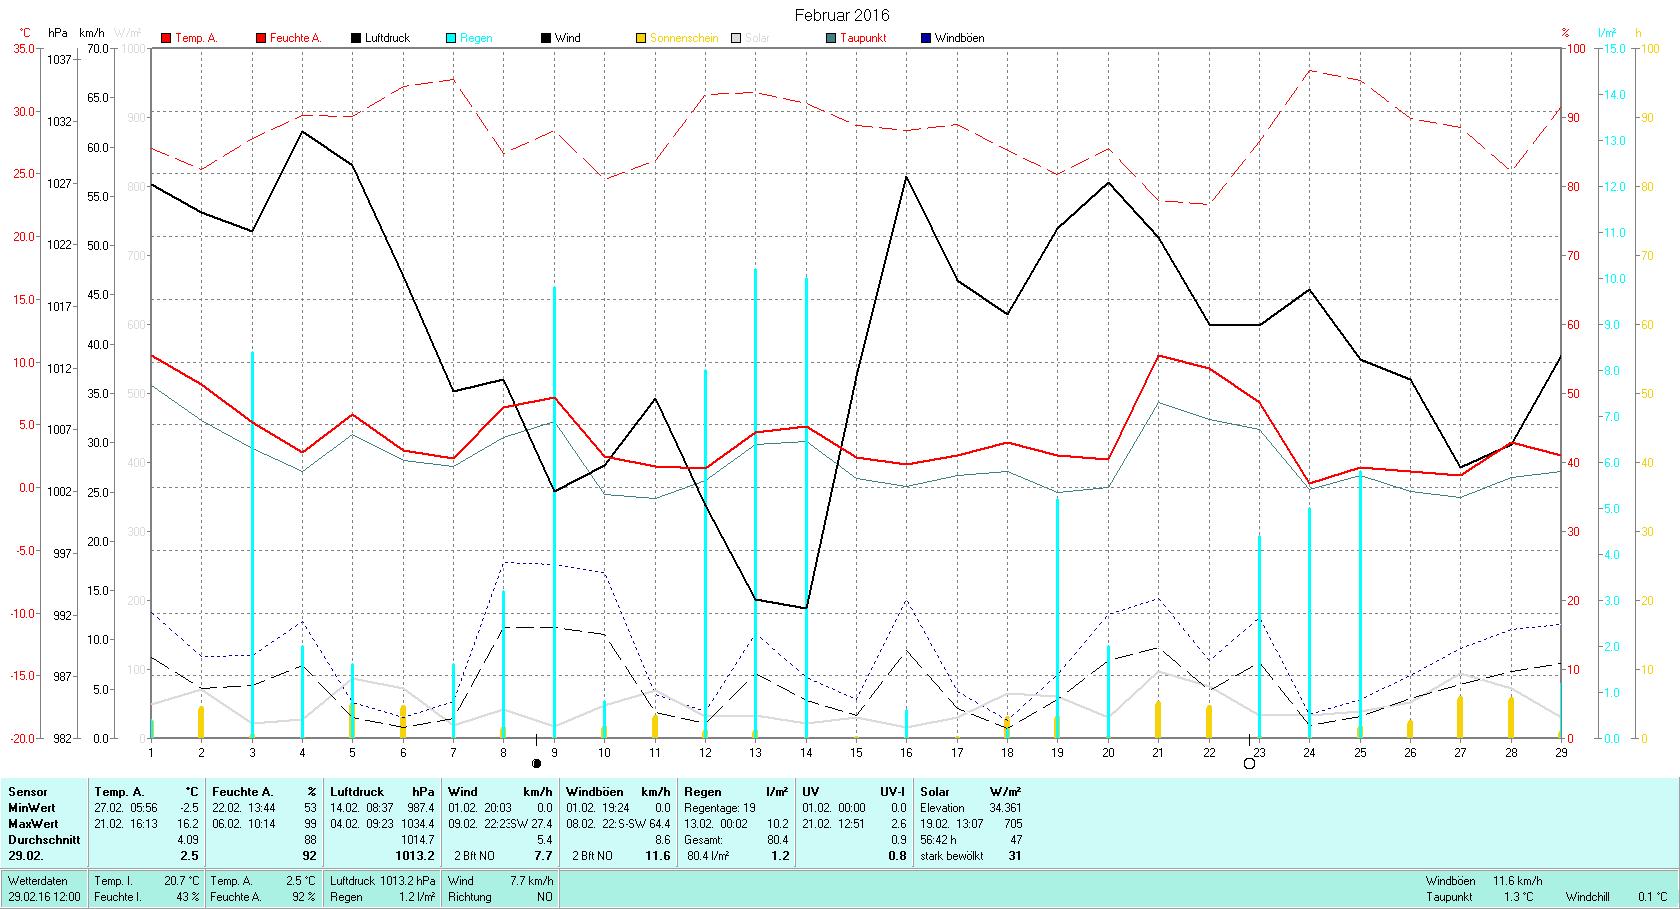 Februar 2016 Tmin -2.5°C, Tmax 16.2°C, Sonne 56:52h, Niederschlag 80.4mm/2